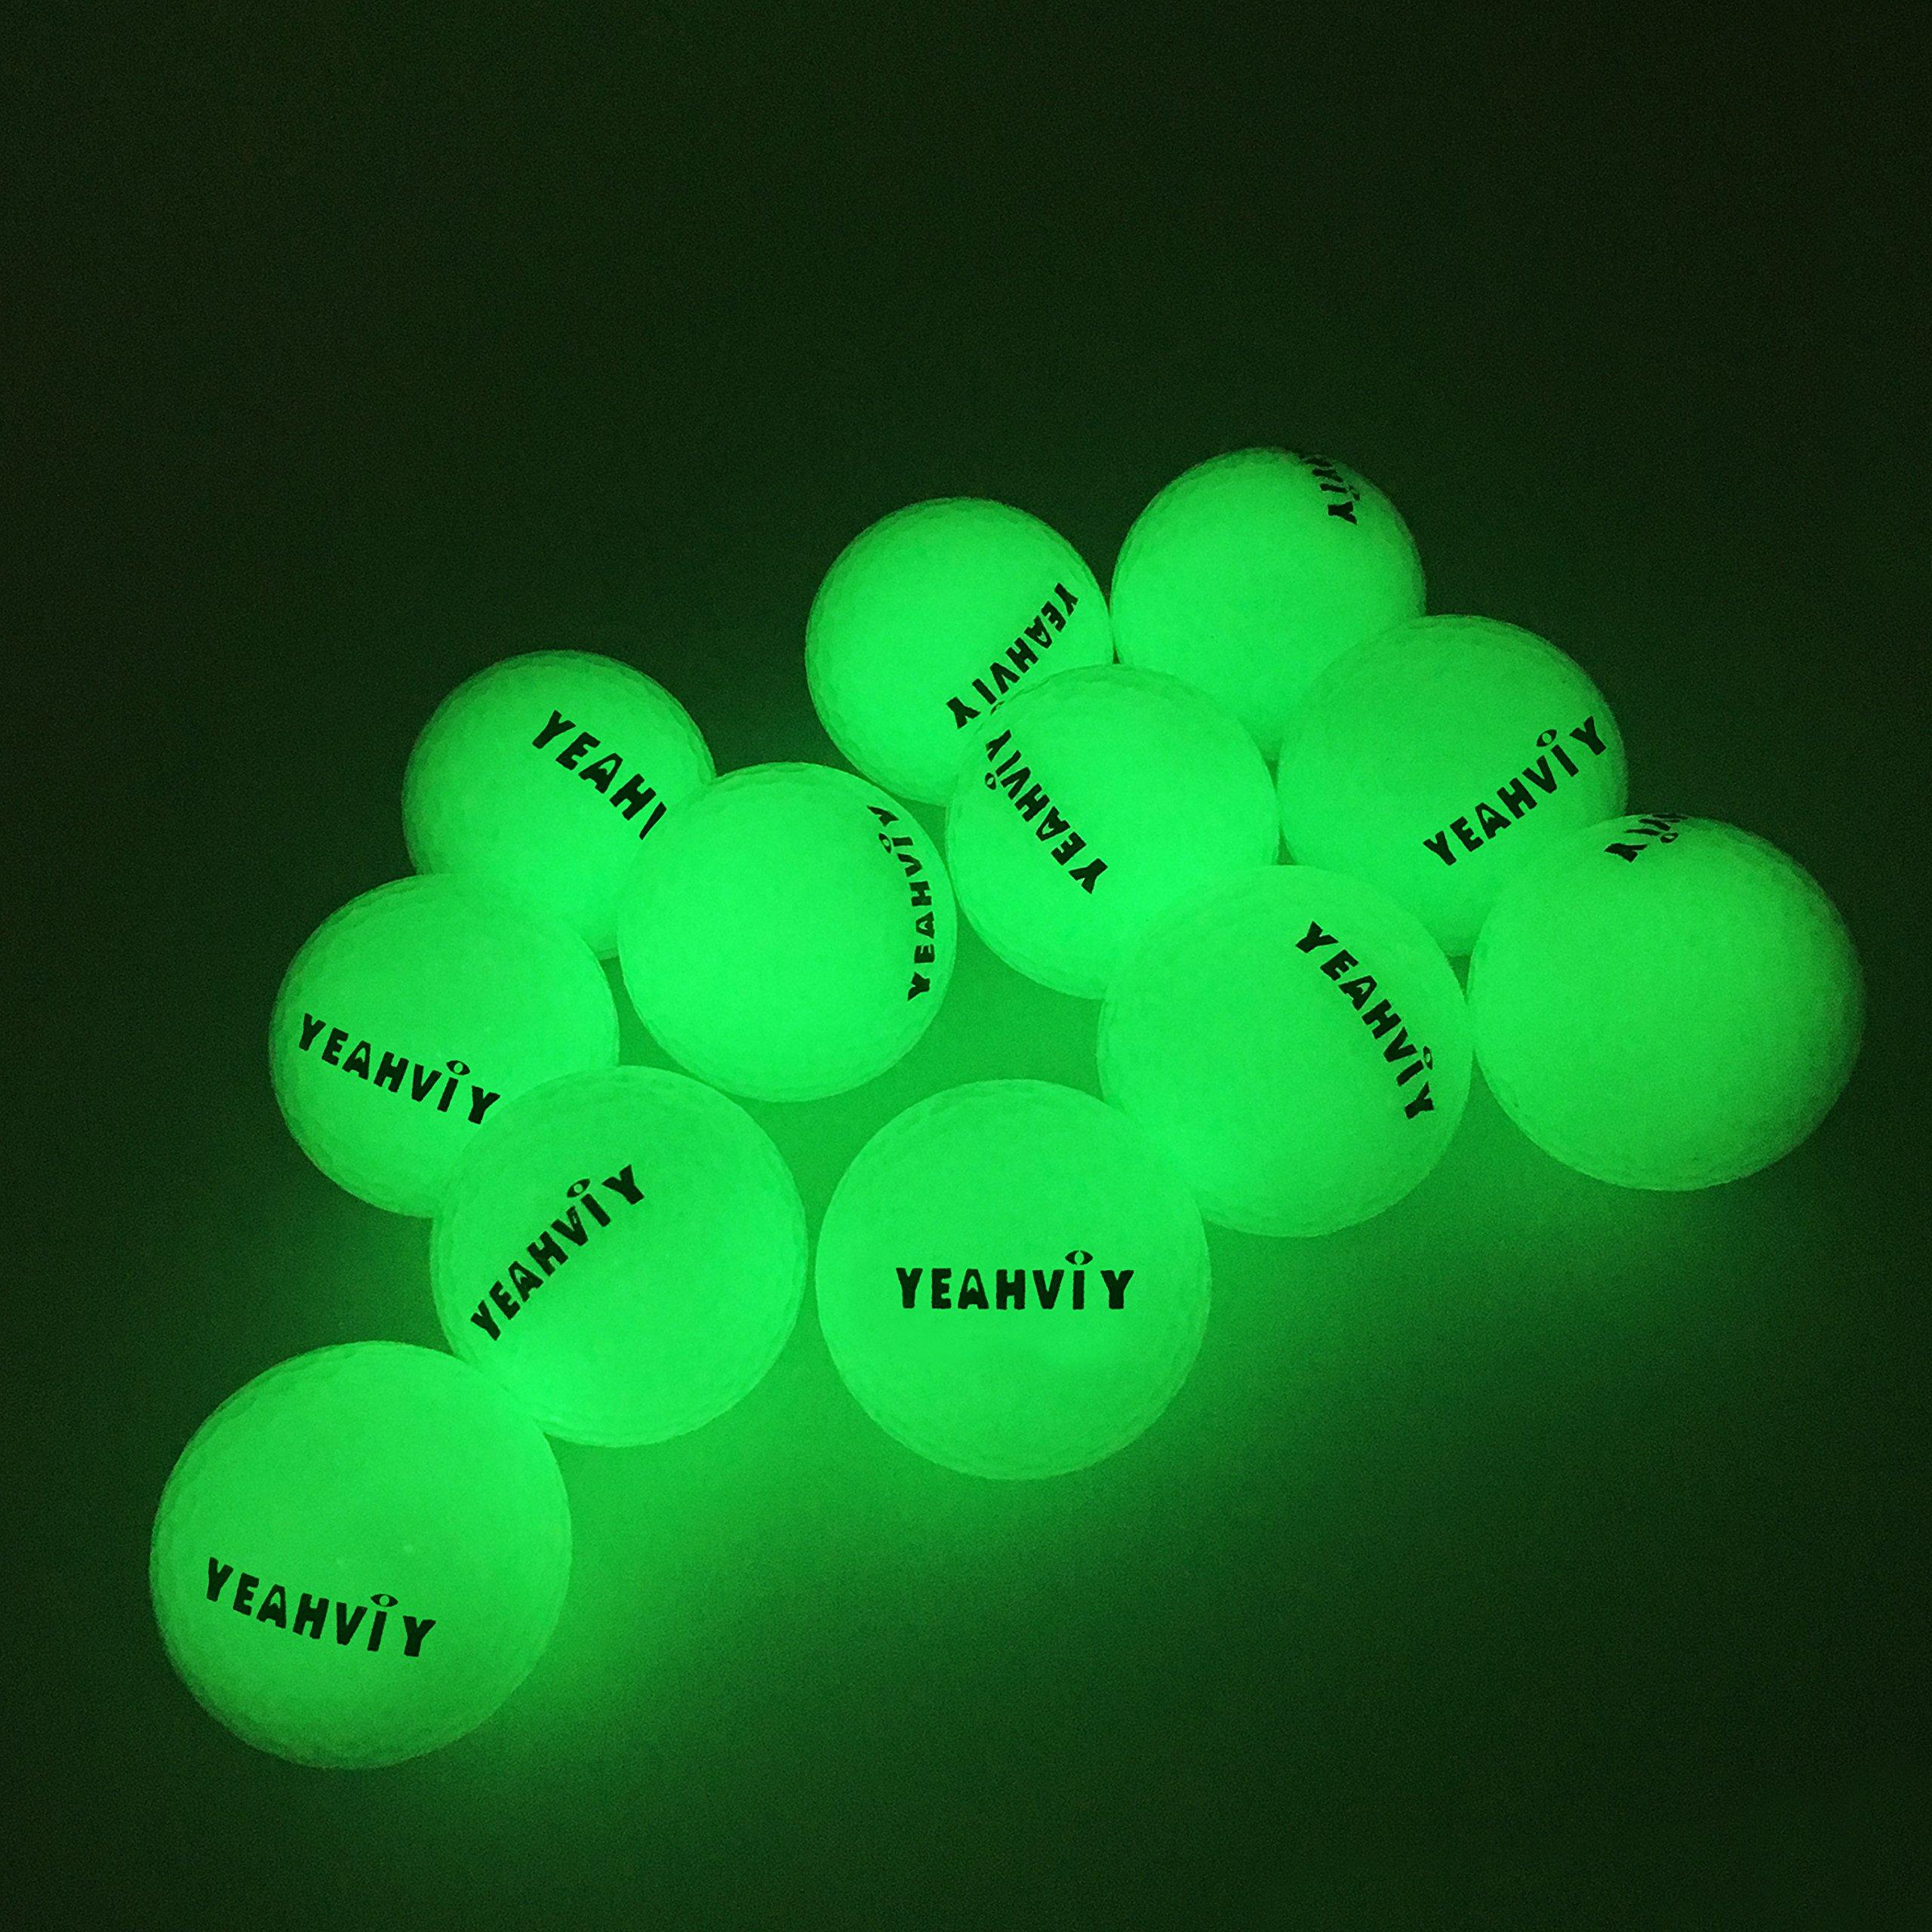 Yeahviy Night Golf Balls,Best Hitting Ultra Bright Long Lasting Reusable Bright Night Glow Golf Ball